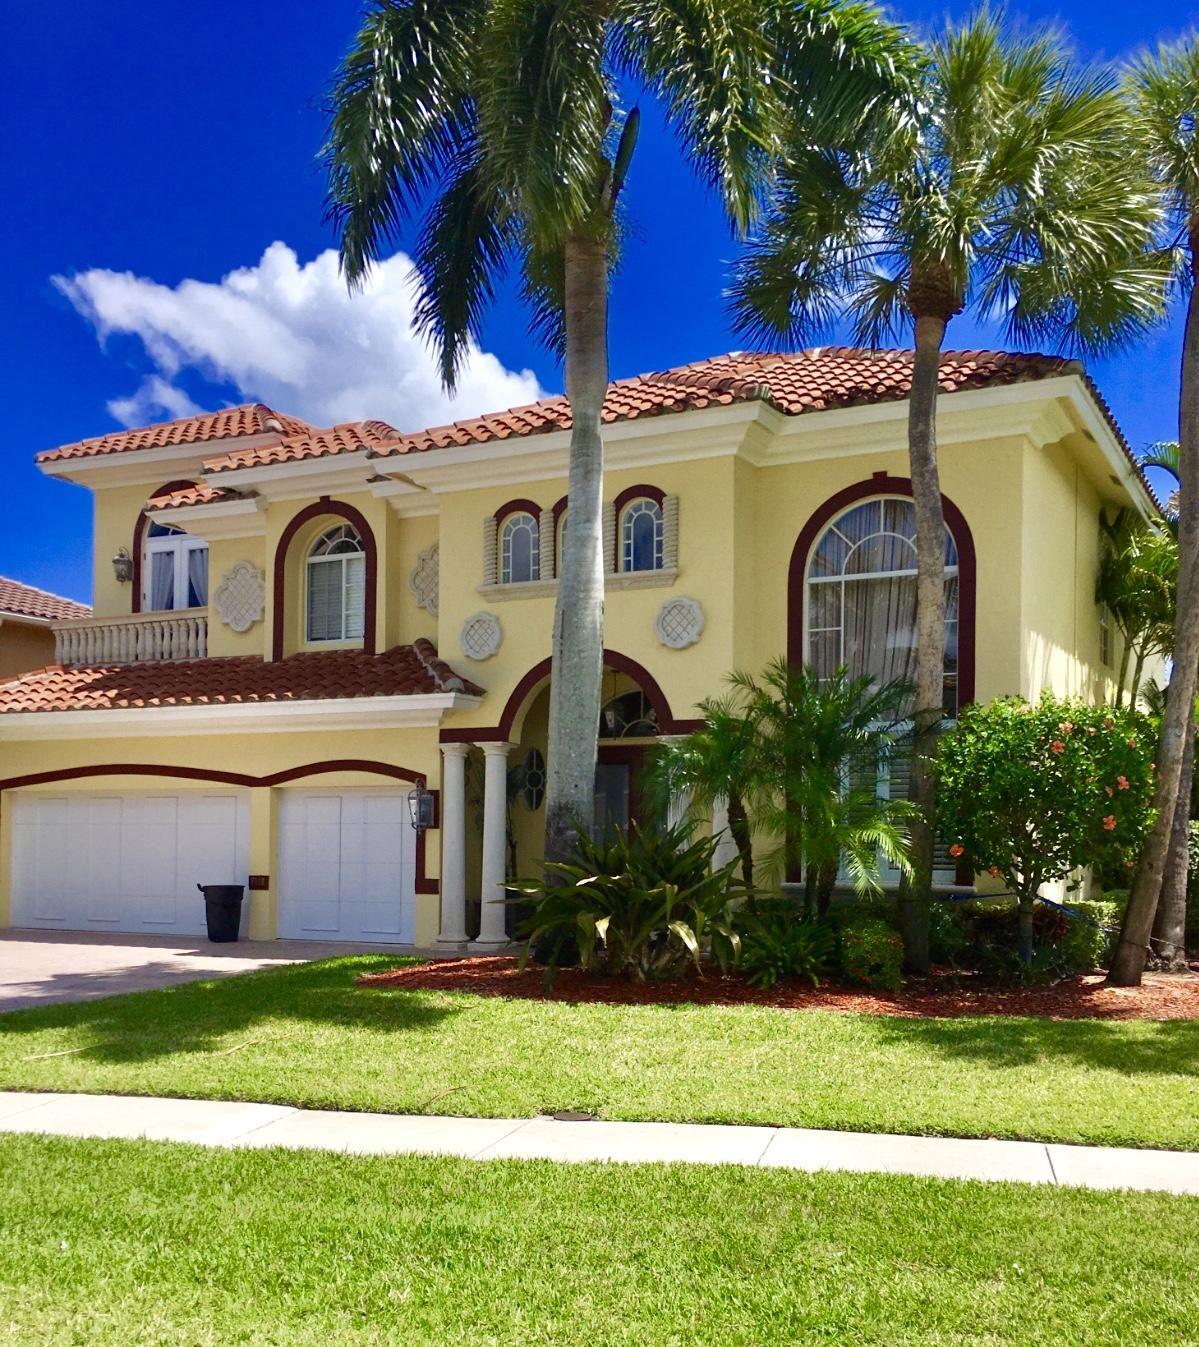 9718 Coronado Lake Drive, Boynton Beach, FL 33437 - #: RX-10558471